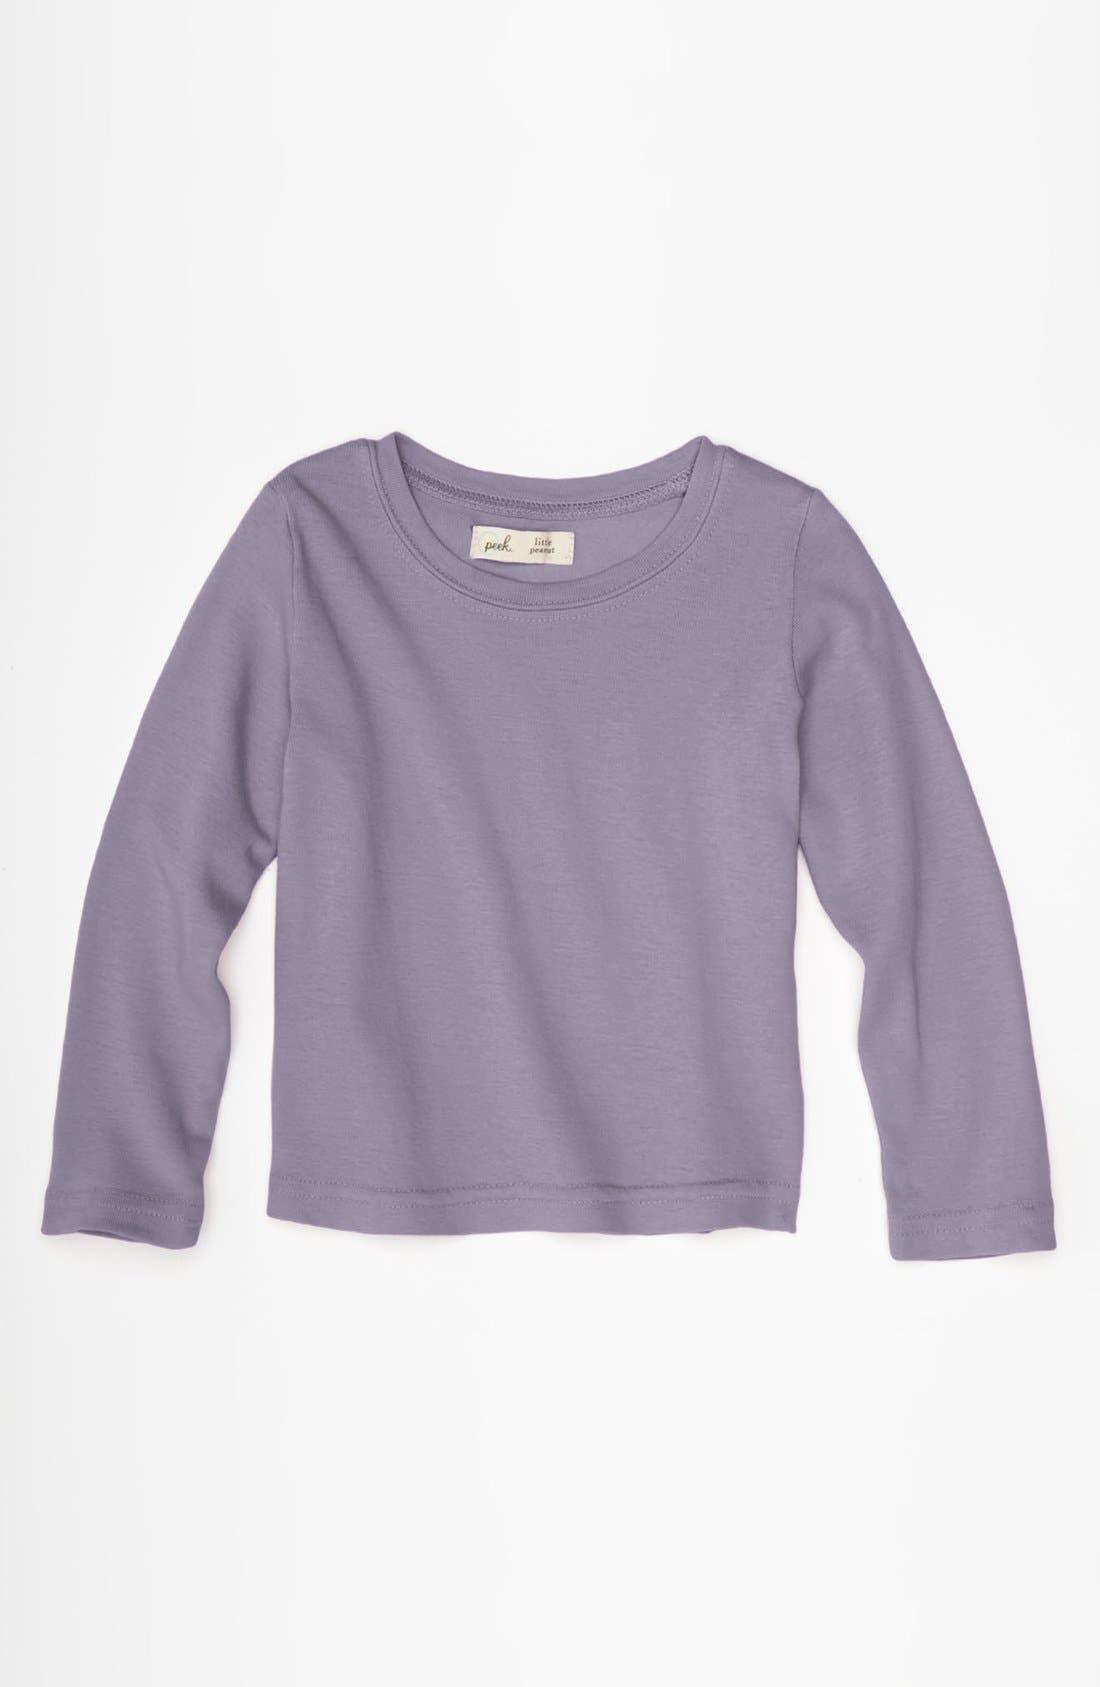 Main Image - Peek 'Little Peanut' Long Sleeve T-Shirt (Baby)